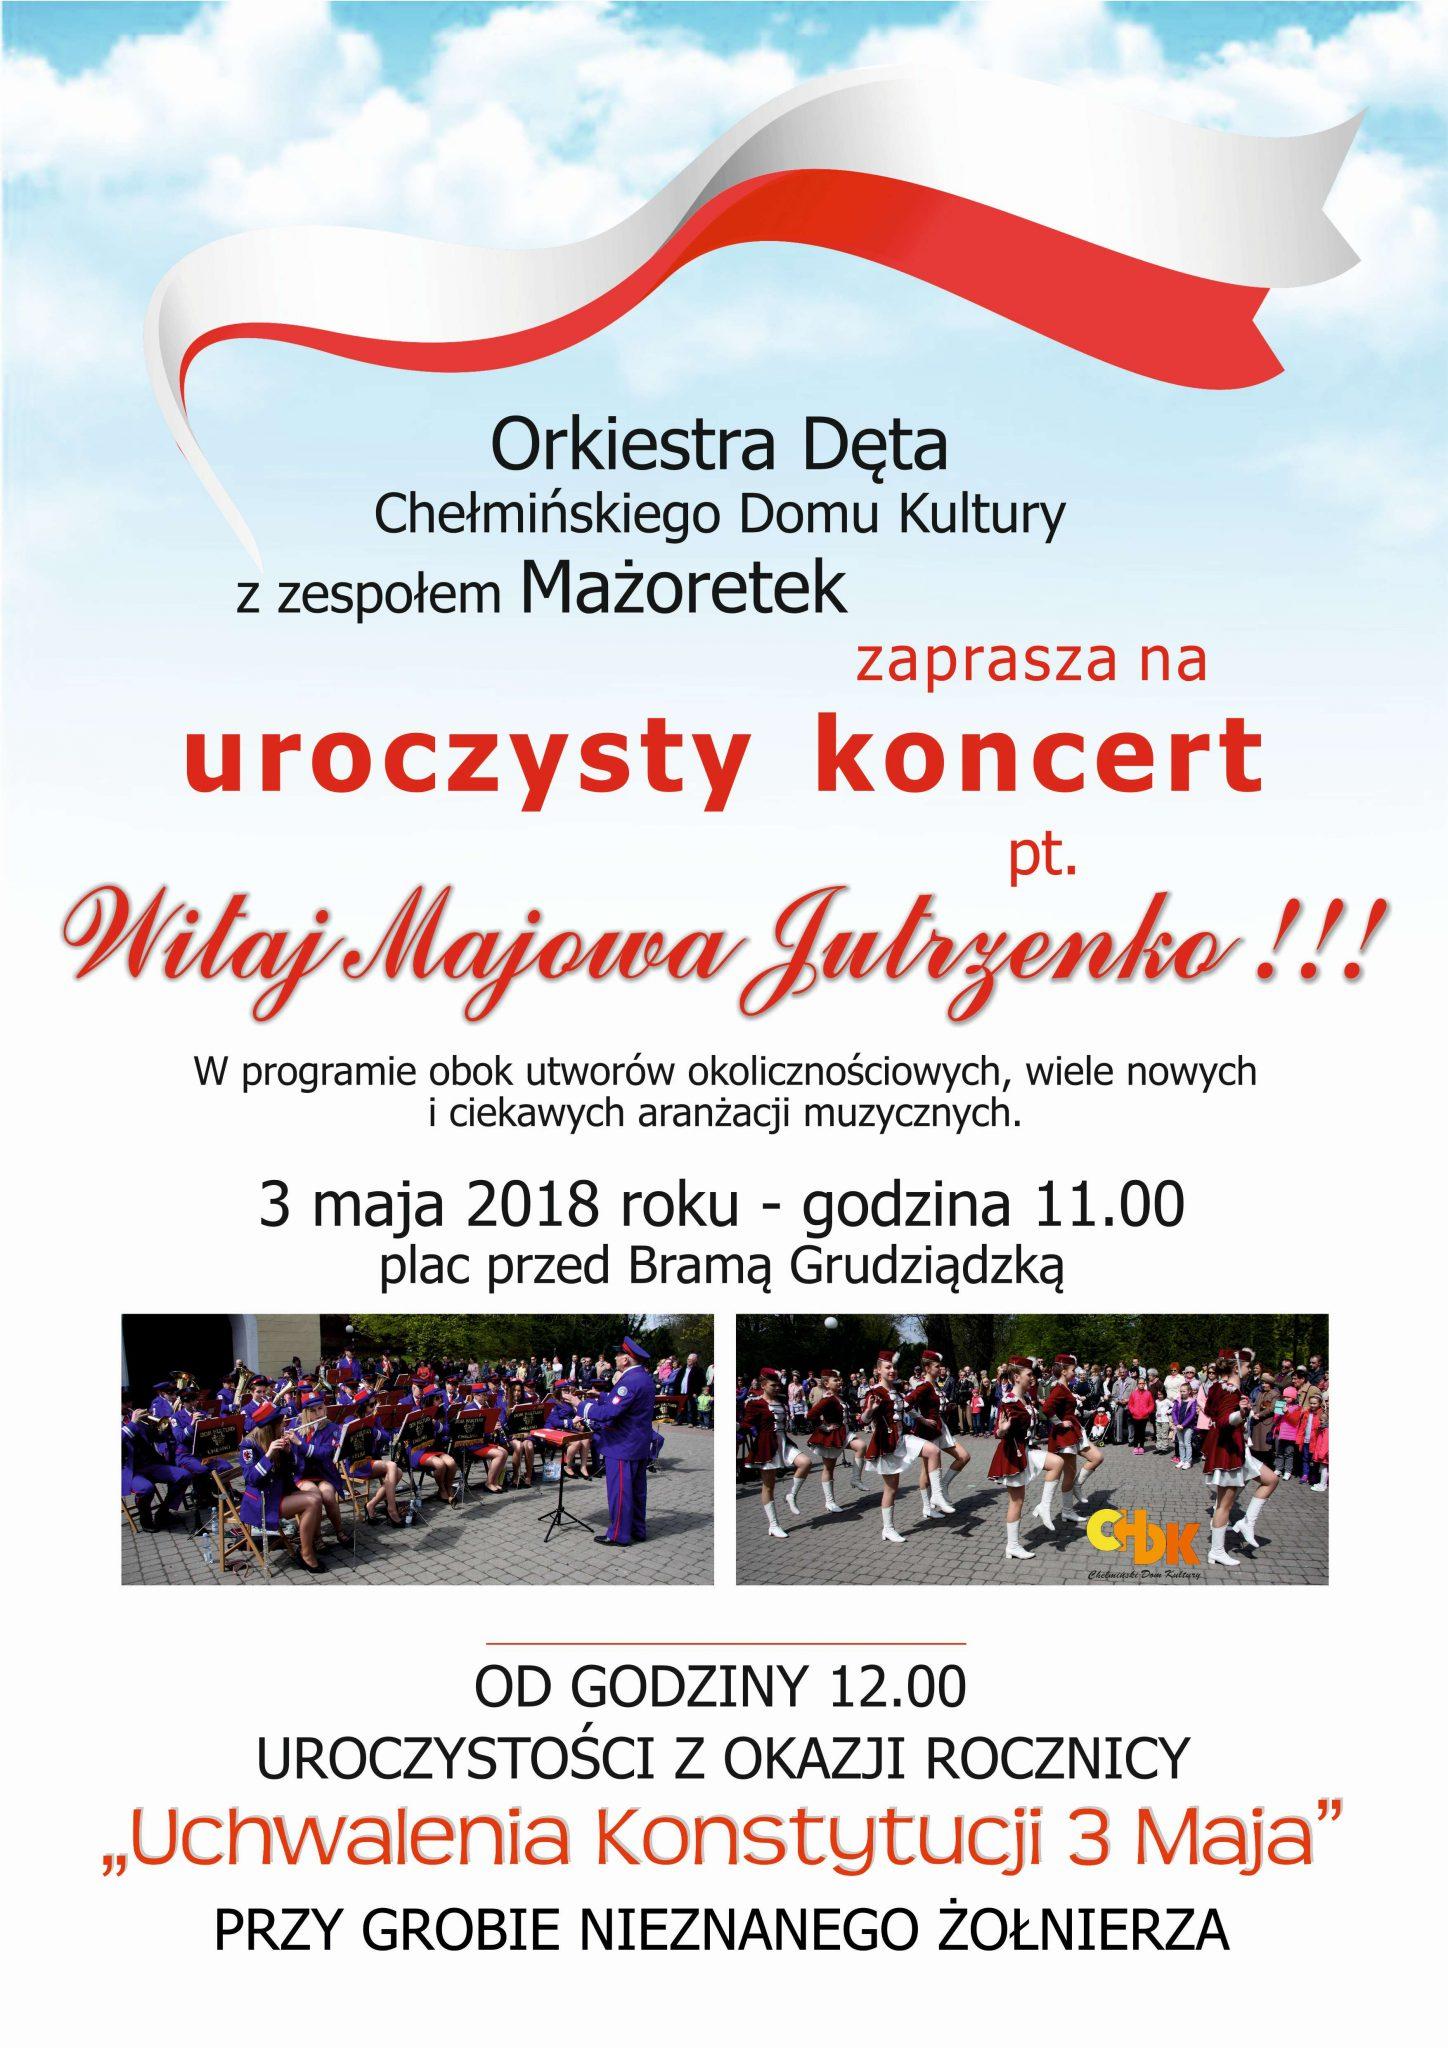 Koncert Orkiestry Dętej i Mażoretek - 3 maja 2018